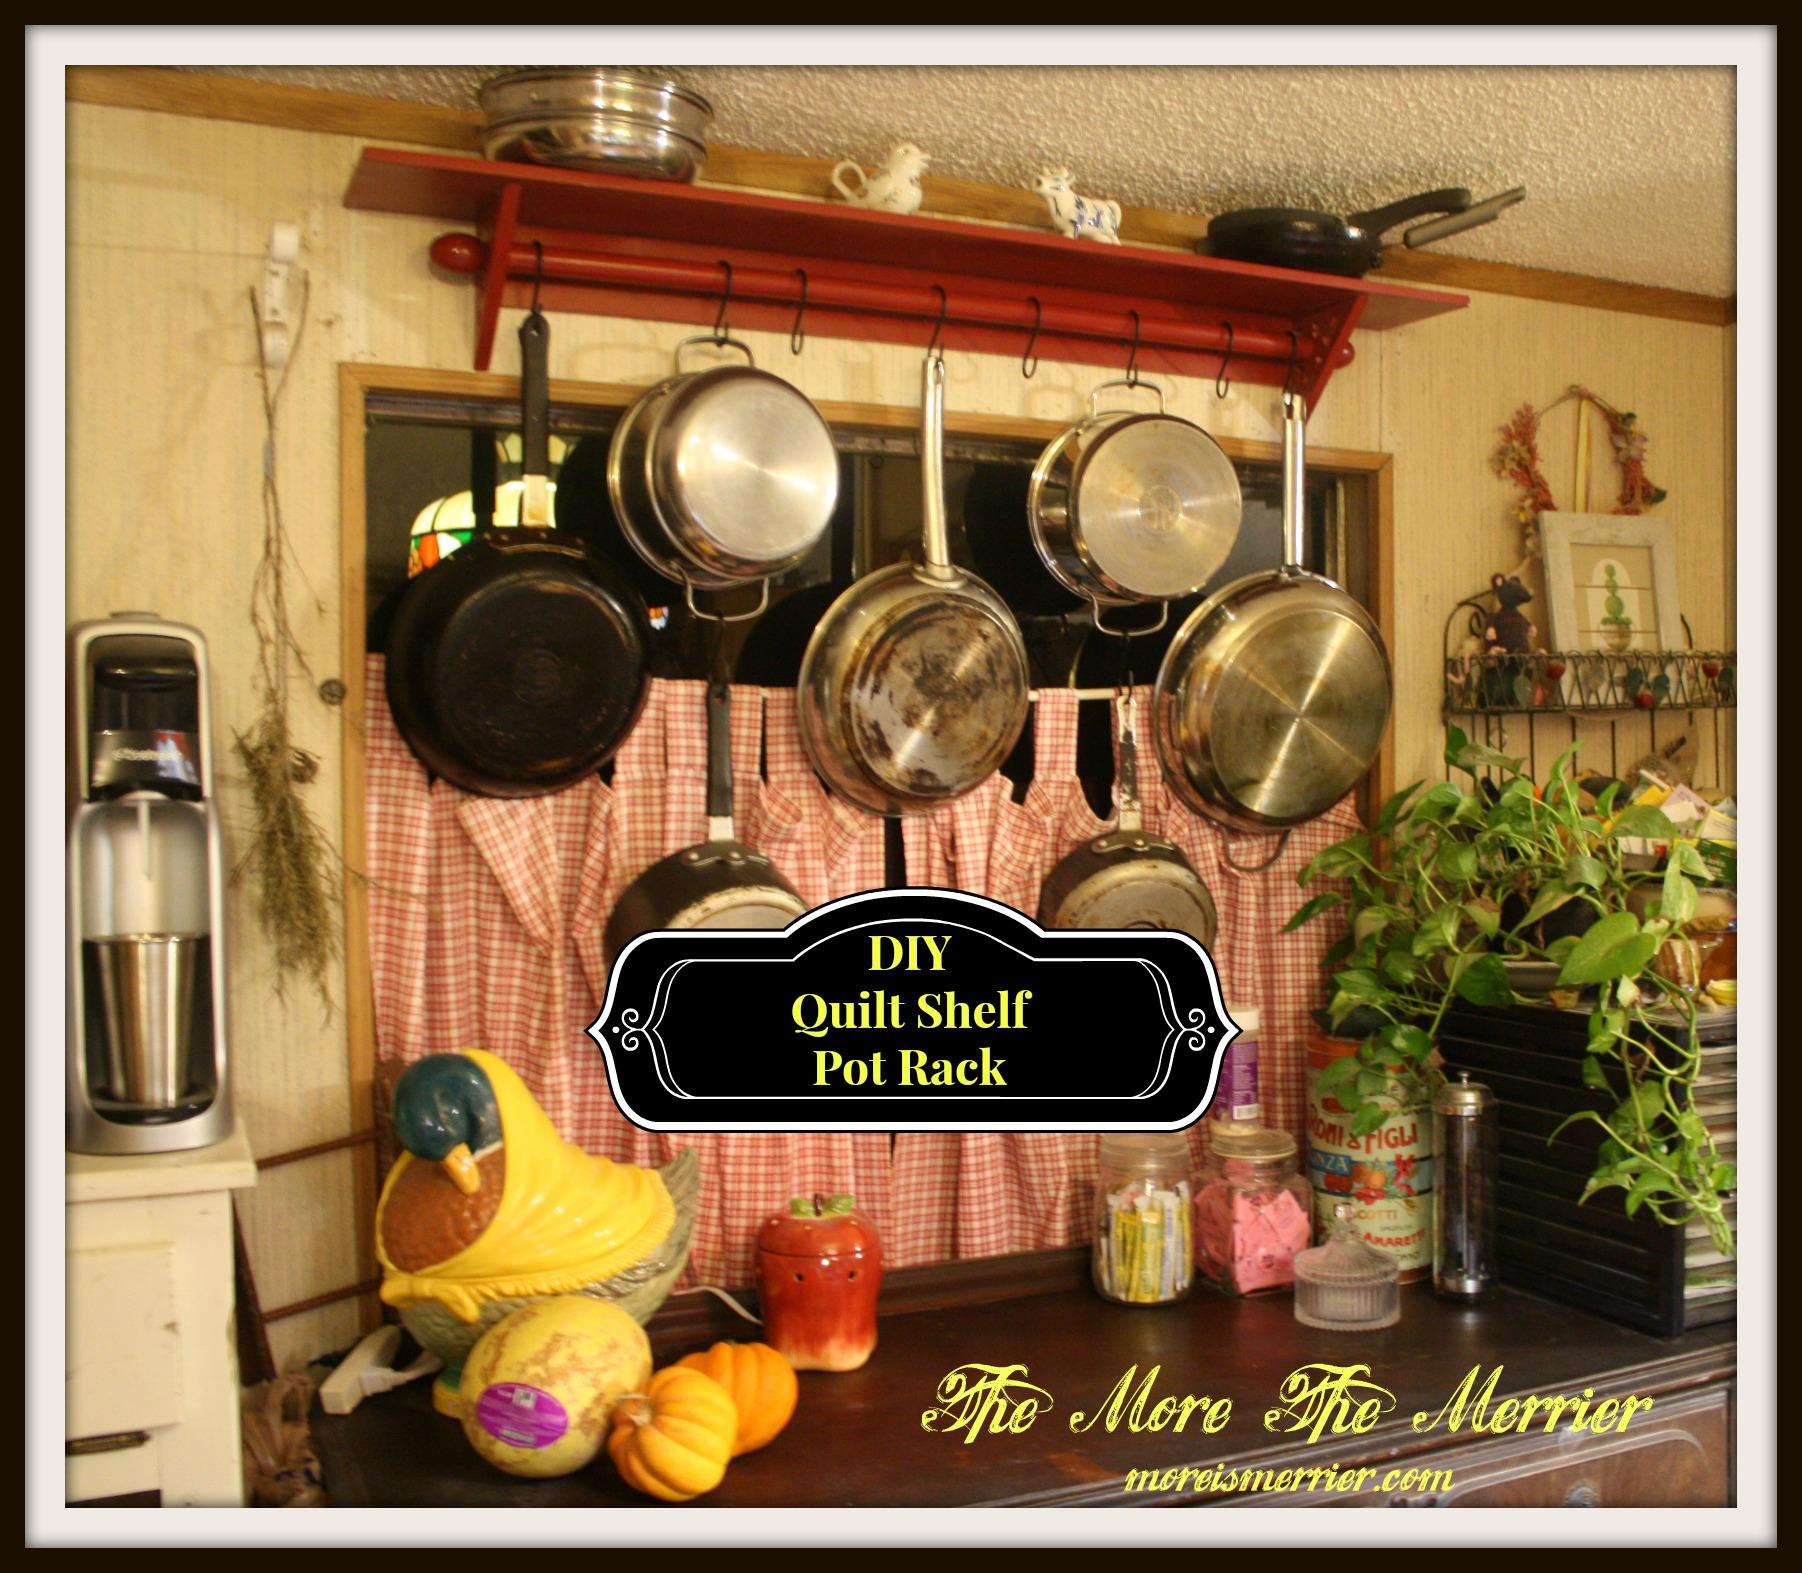 DIY: Quilt Shelf Pot Rack - The More The Merrier